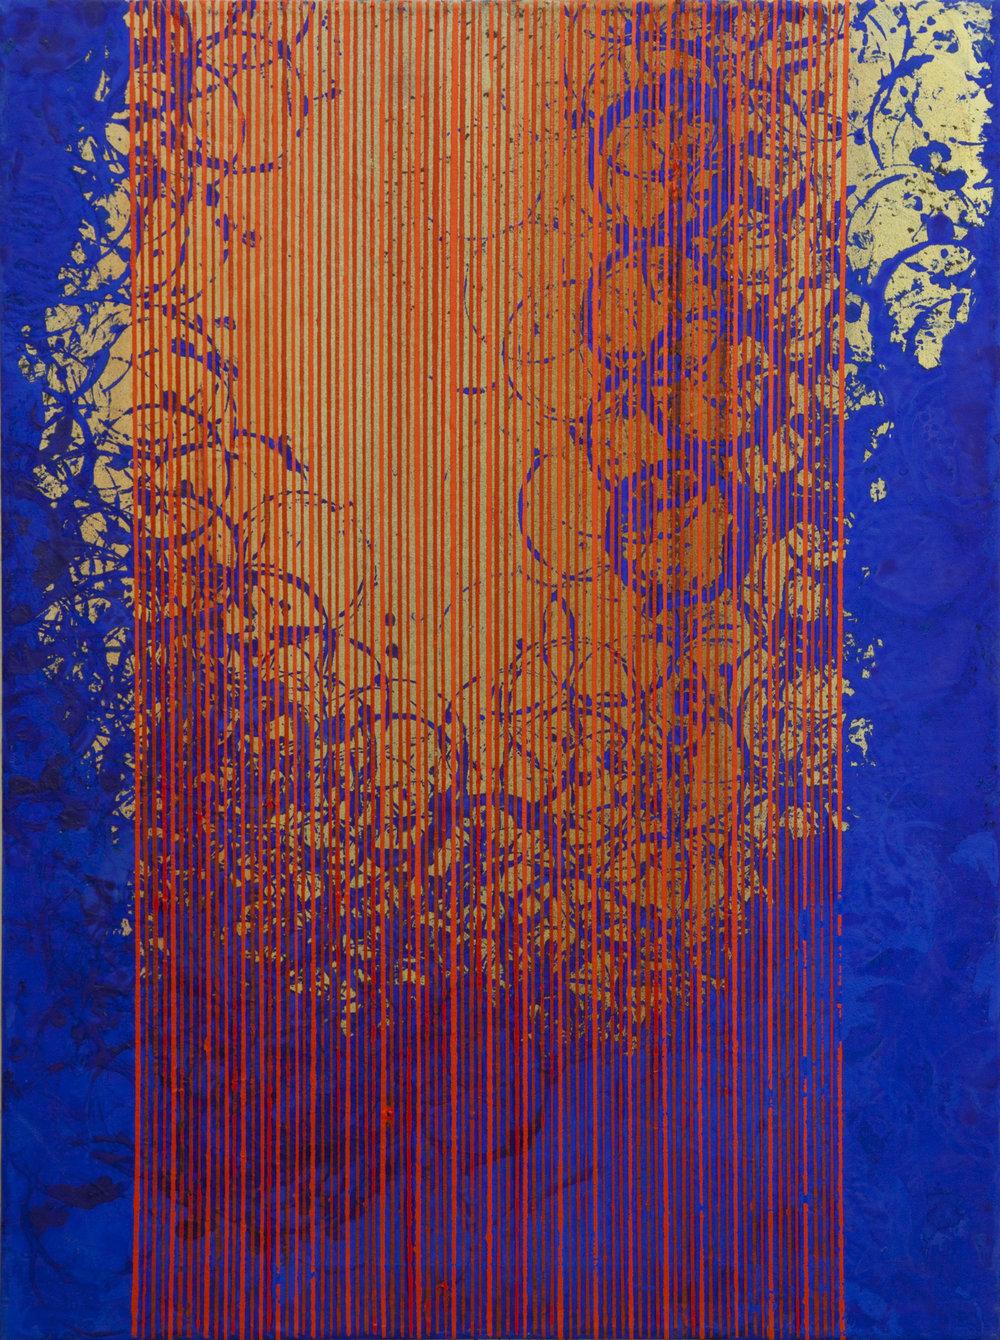 DONATION 2 Herbert Egger –TRANSIT I-2016-60 x 80 cm-pigment and acrylic on canvas.jpg